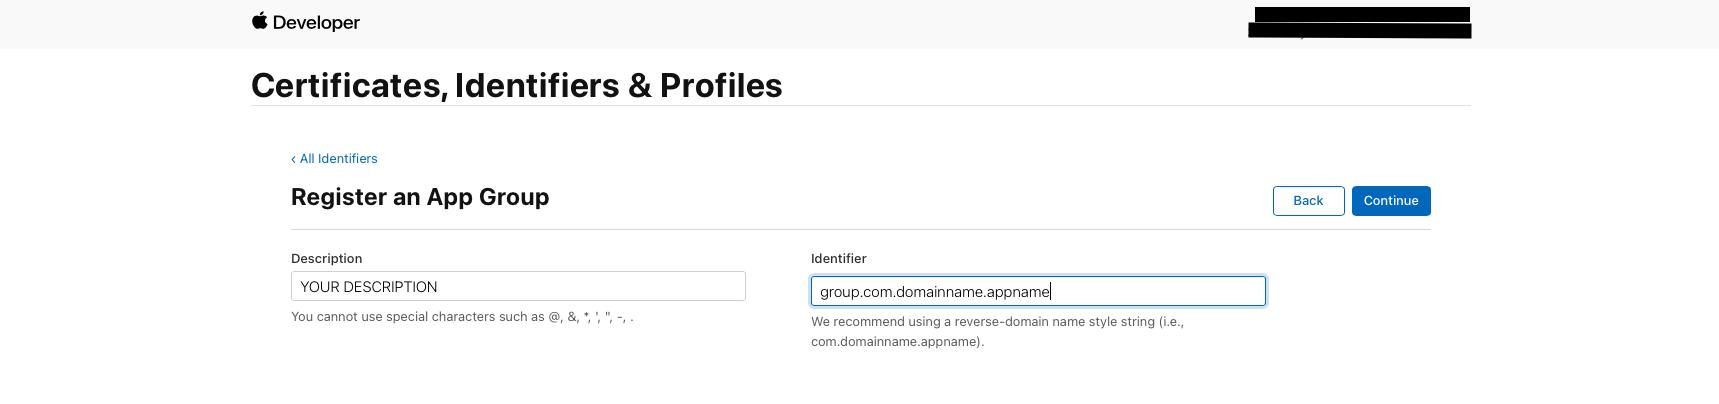 App Group Configuration step 2